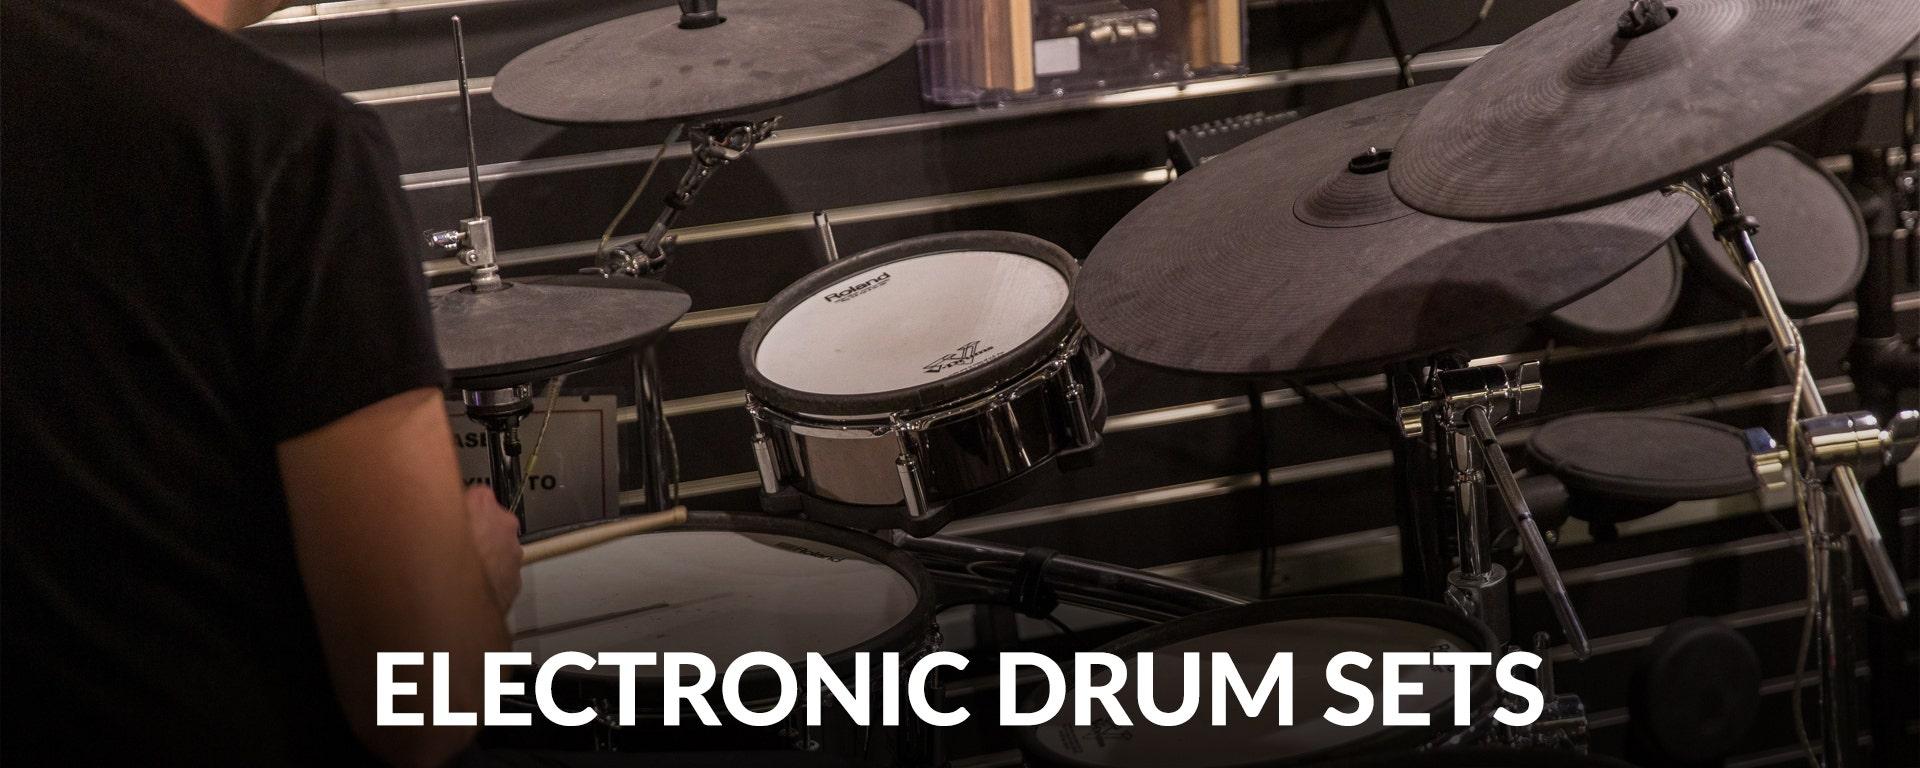 Electronic Drum Sets at samash.com